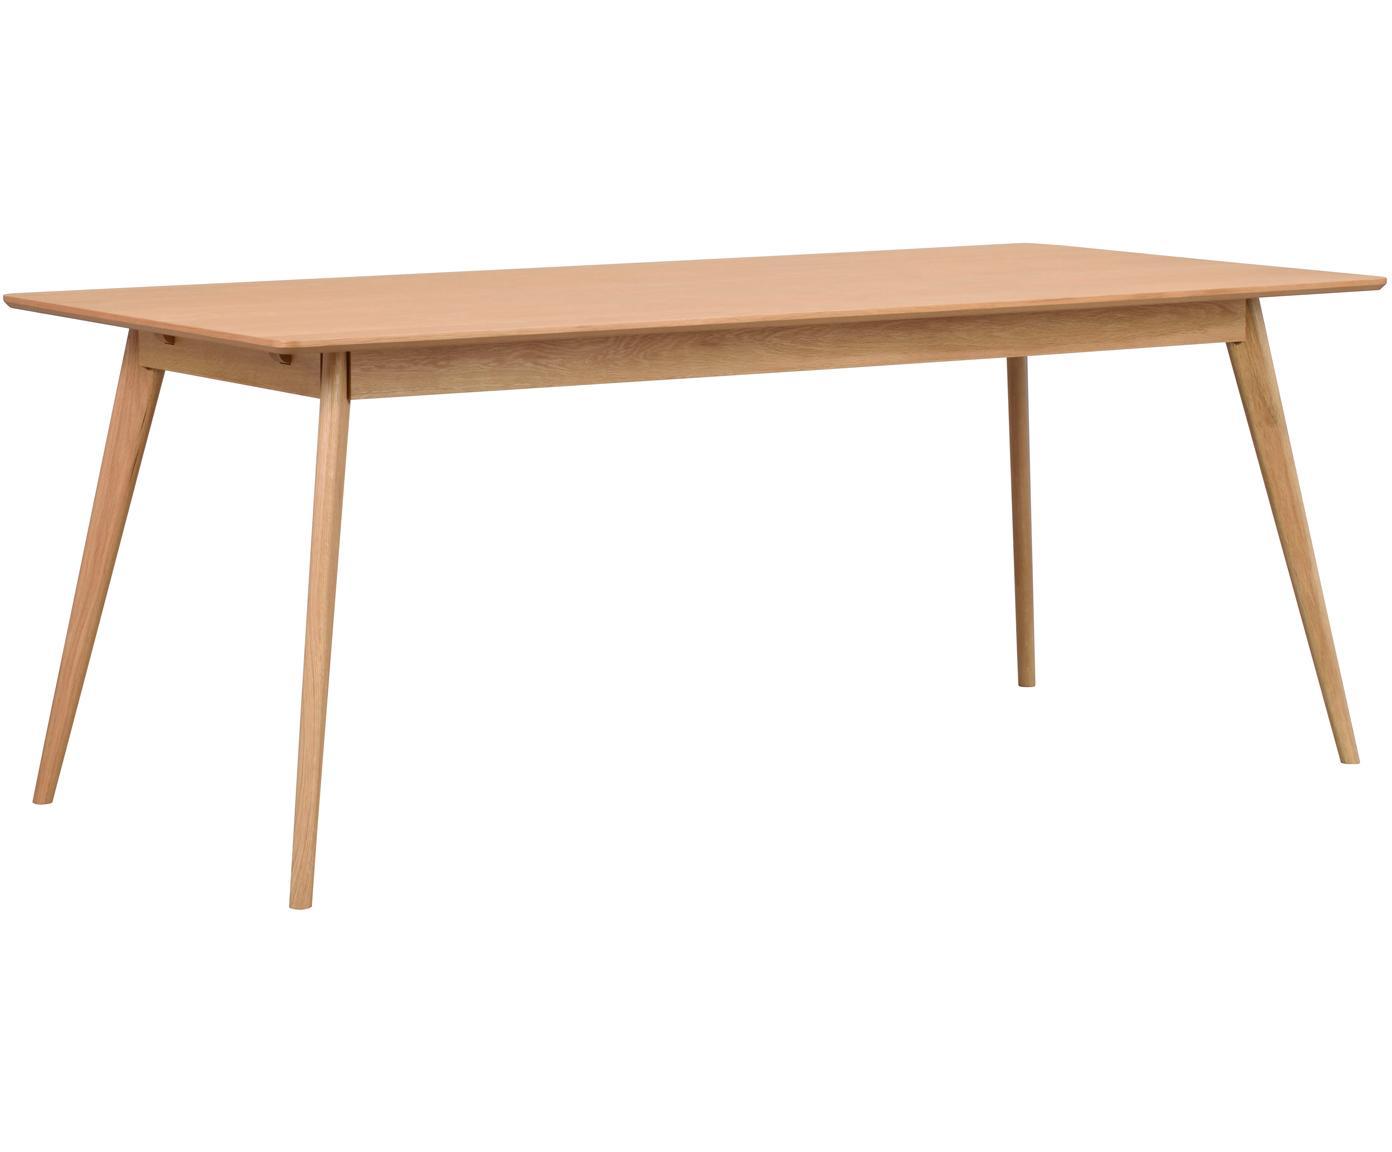 Eettafel Yumi in Scandi design, Tafelblad: MDF, gelakt essenhoutfine, Poten: massief gebeitst rubberho, Eikenhoutkleurig, B 190 x D 90 cm